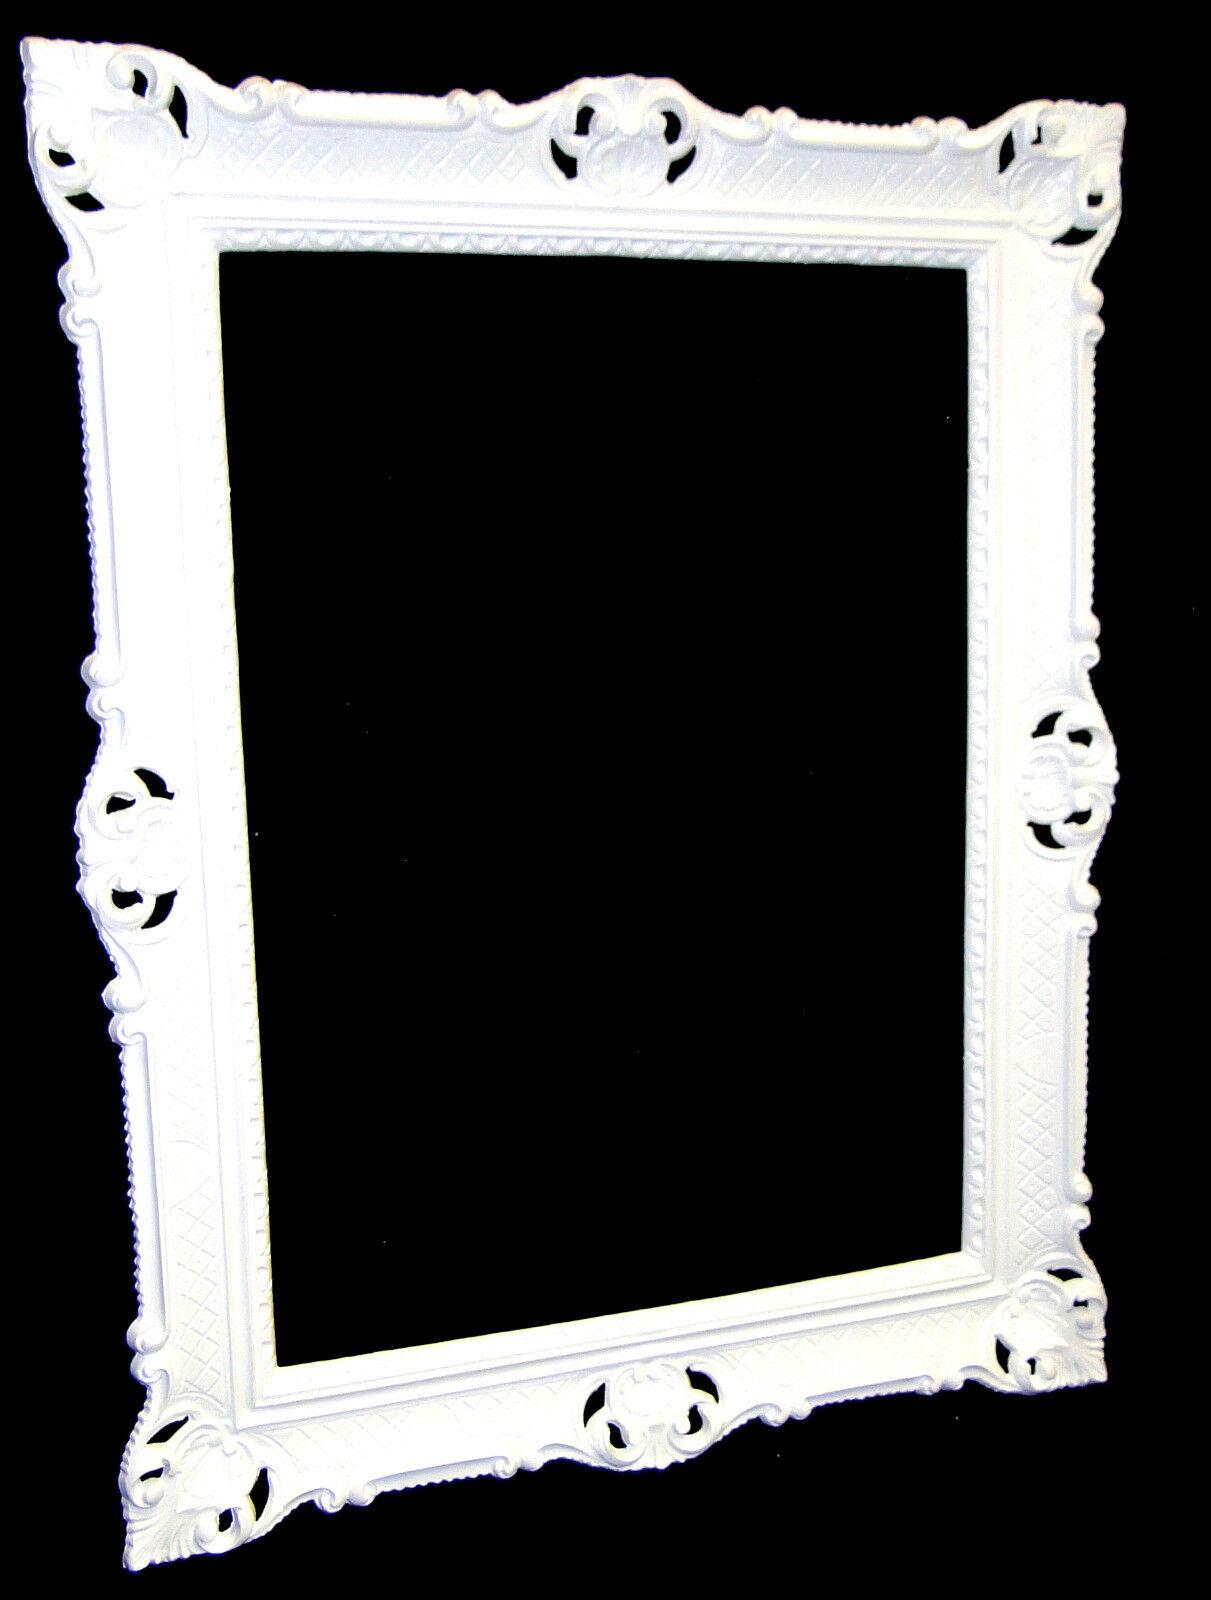 bilderrahmen gro 90x70 bilderahmen barock rechteckig wei. Black Bedroom Furniture Sets. Home Design Ideas